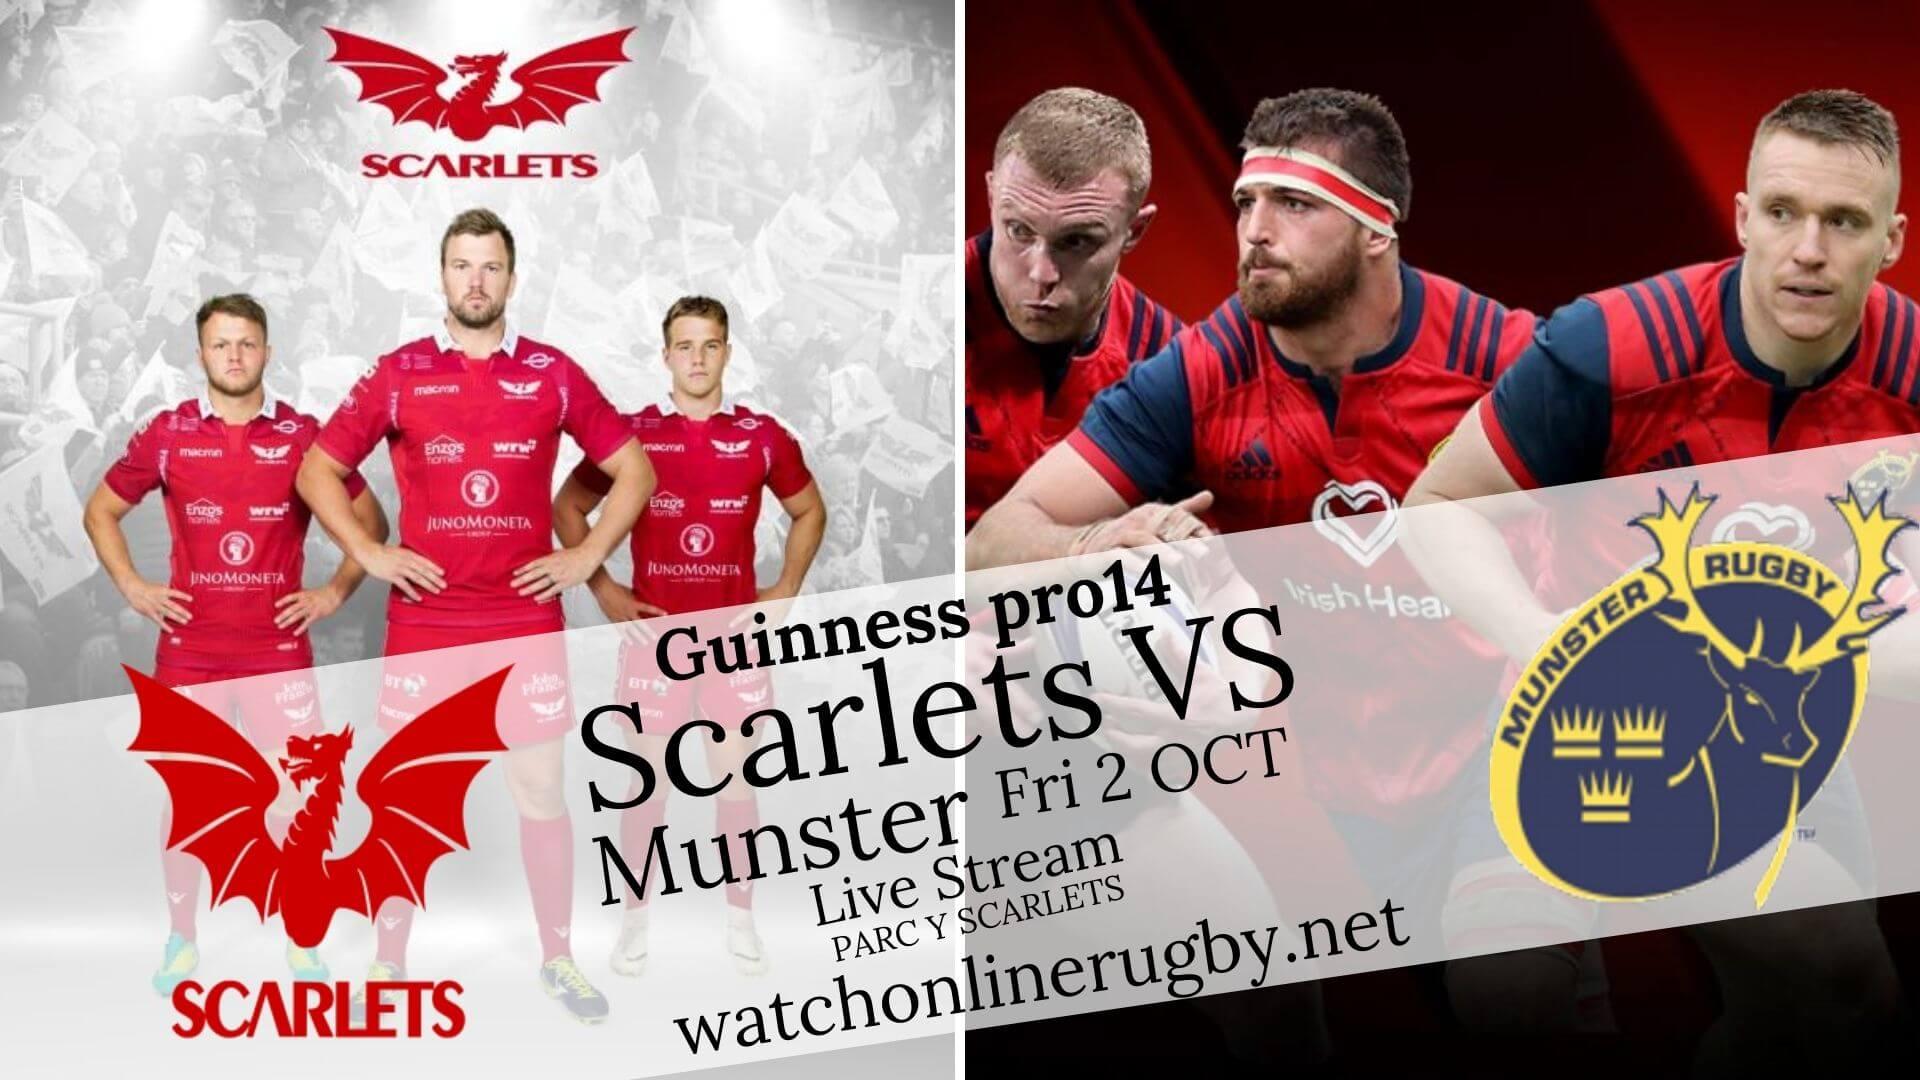 live-munster-vs-scarlets-rugby-stream